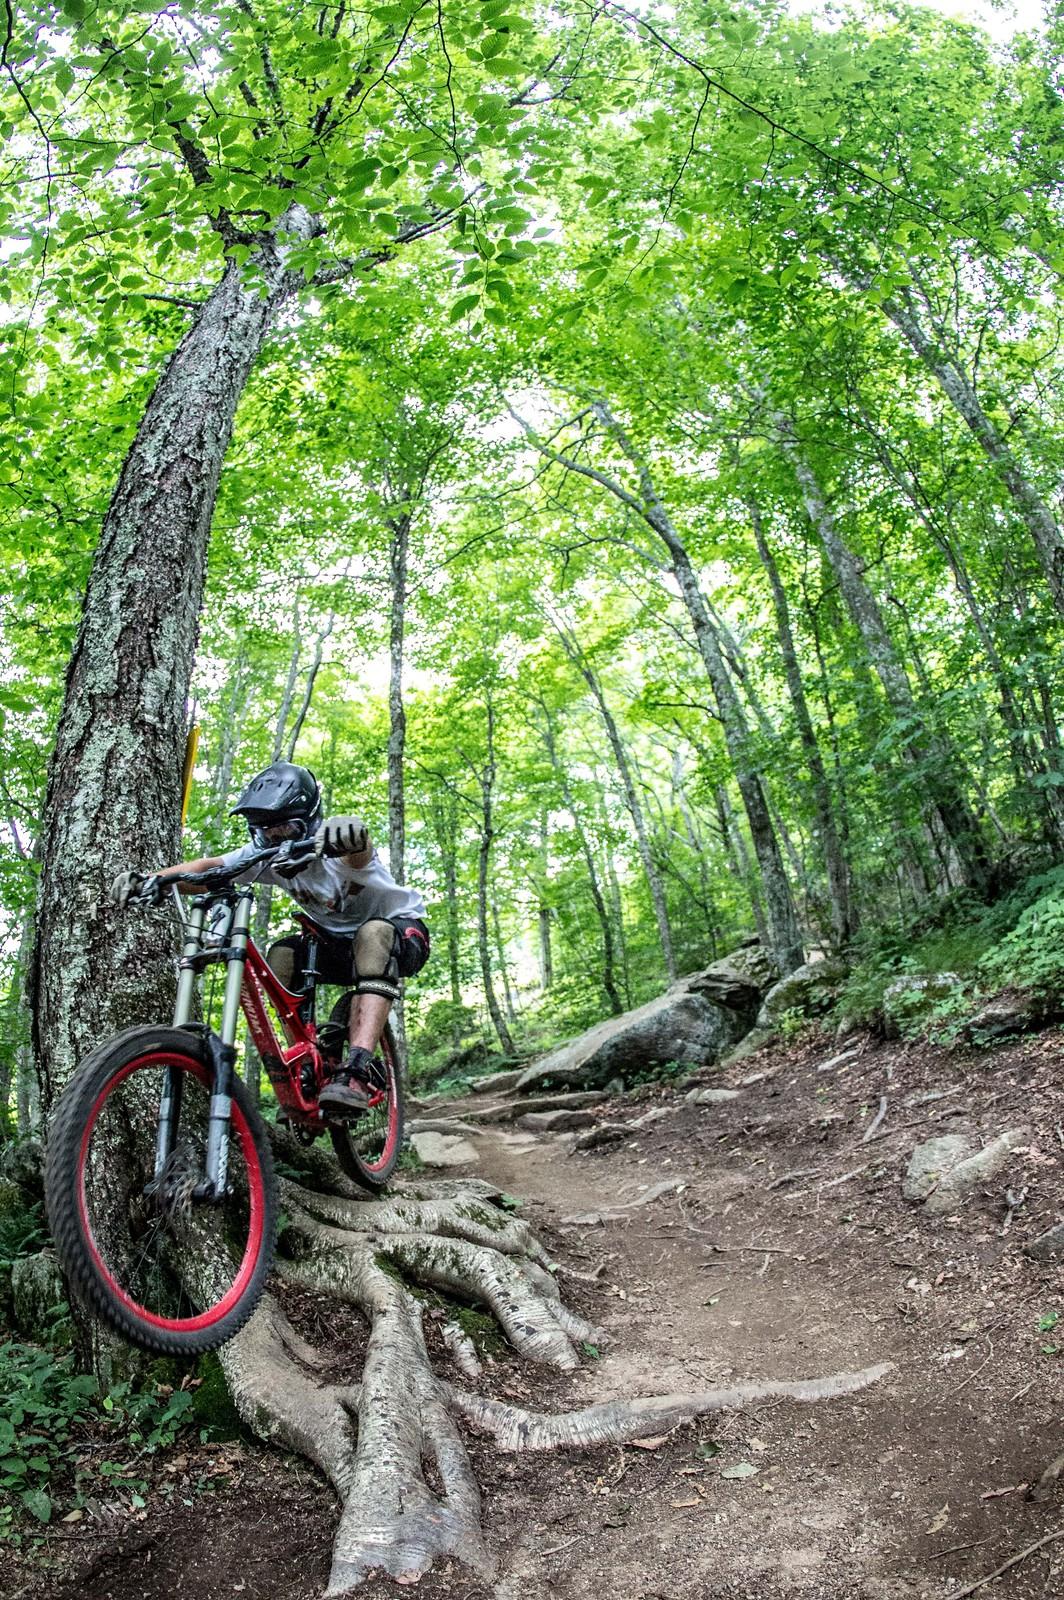 IMG 3847 - mtndrew - Mountain Biking Pictures - Vital MTB